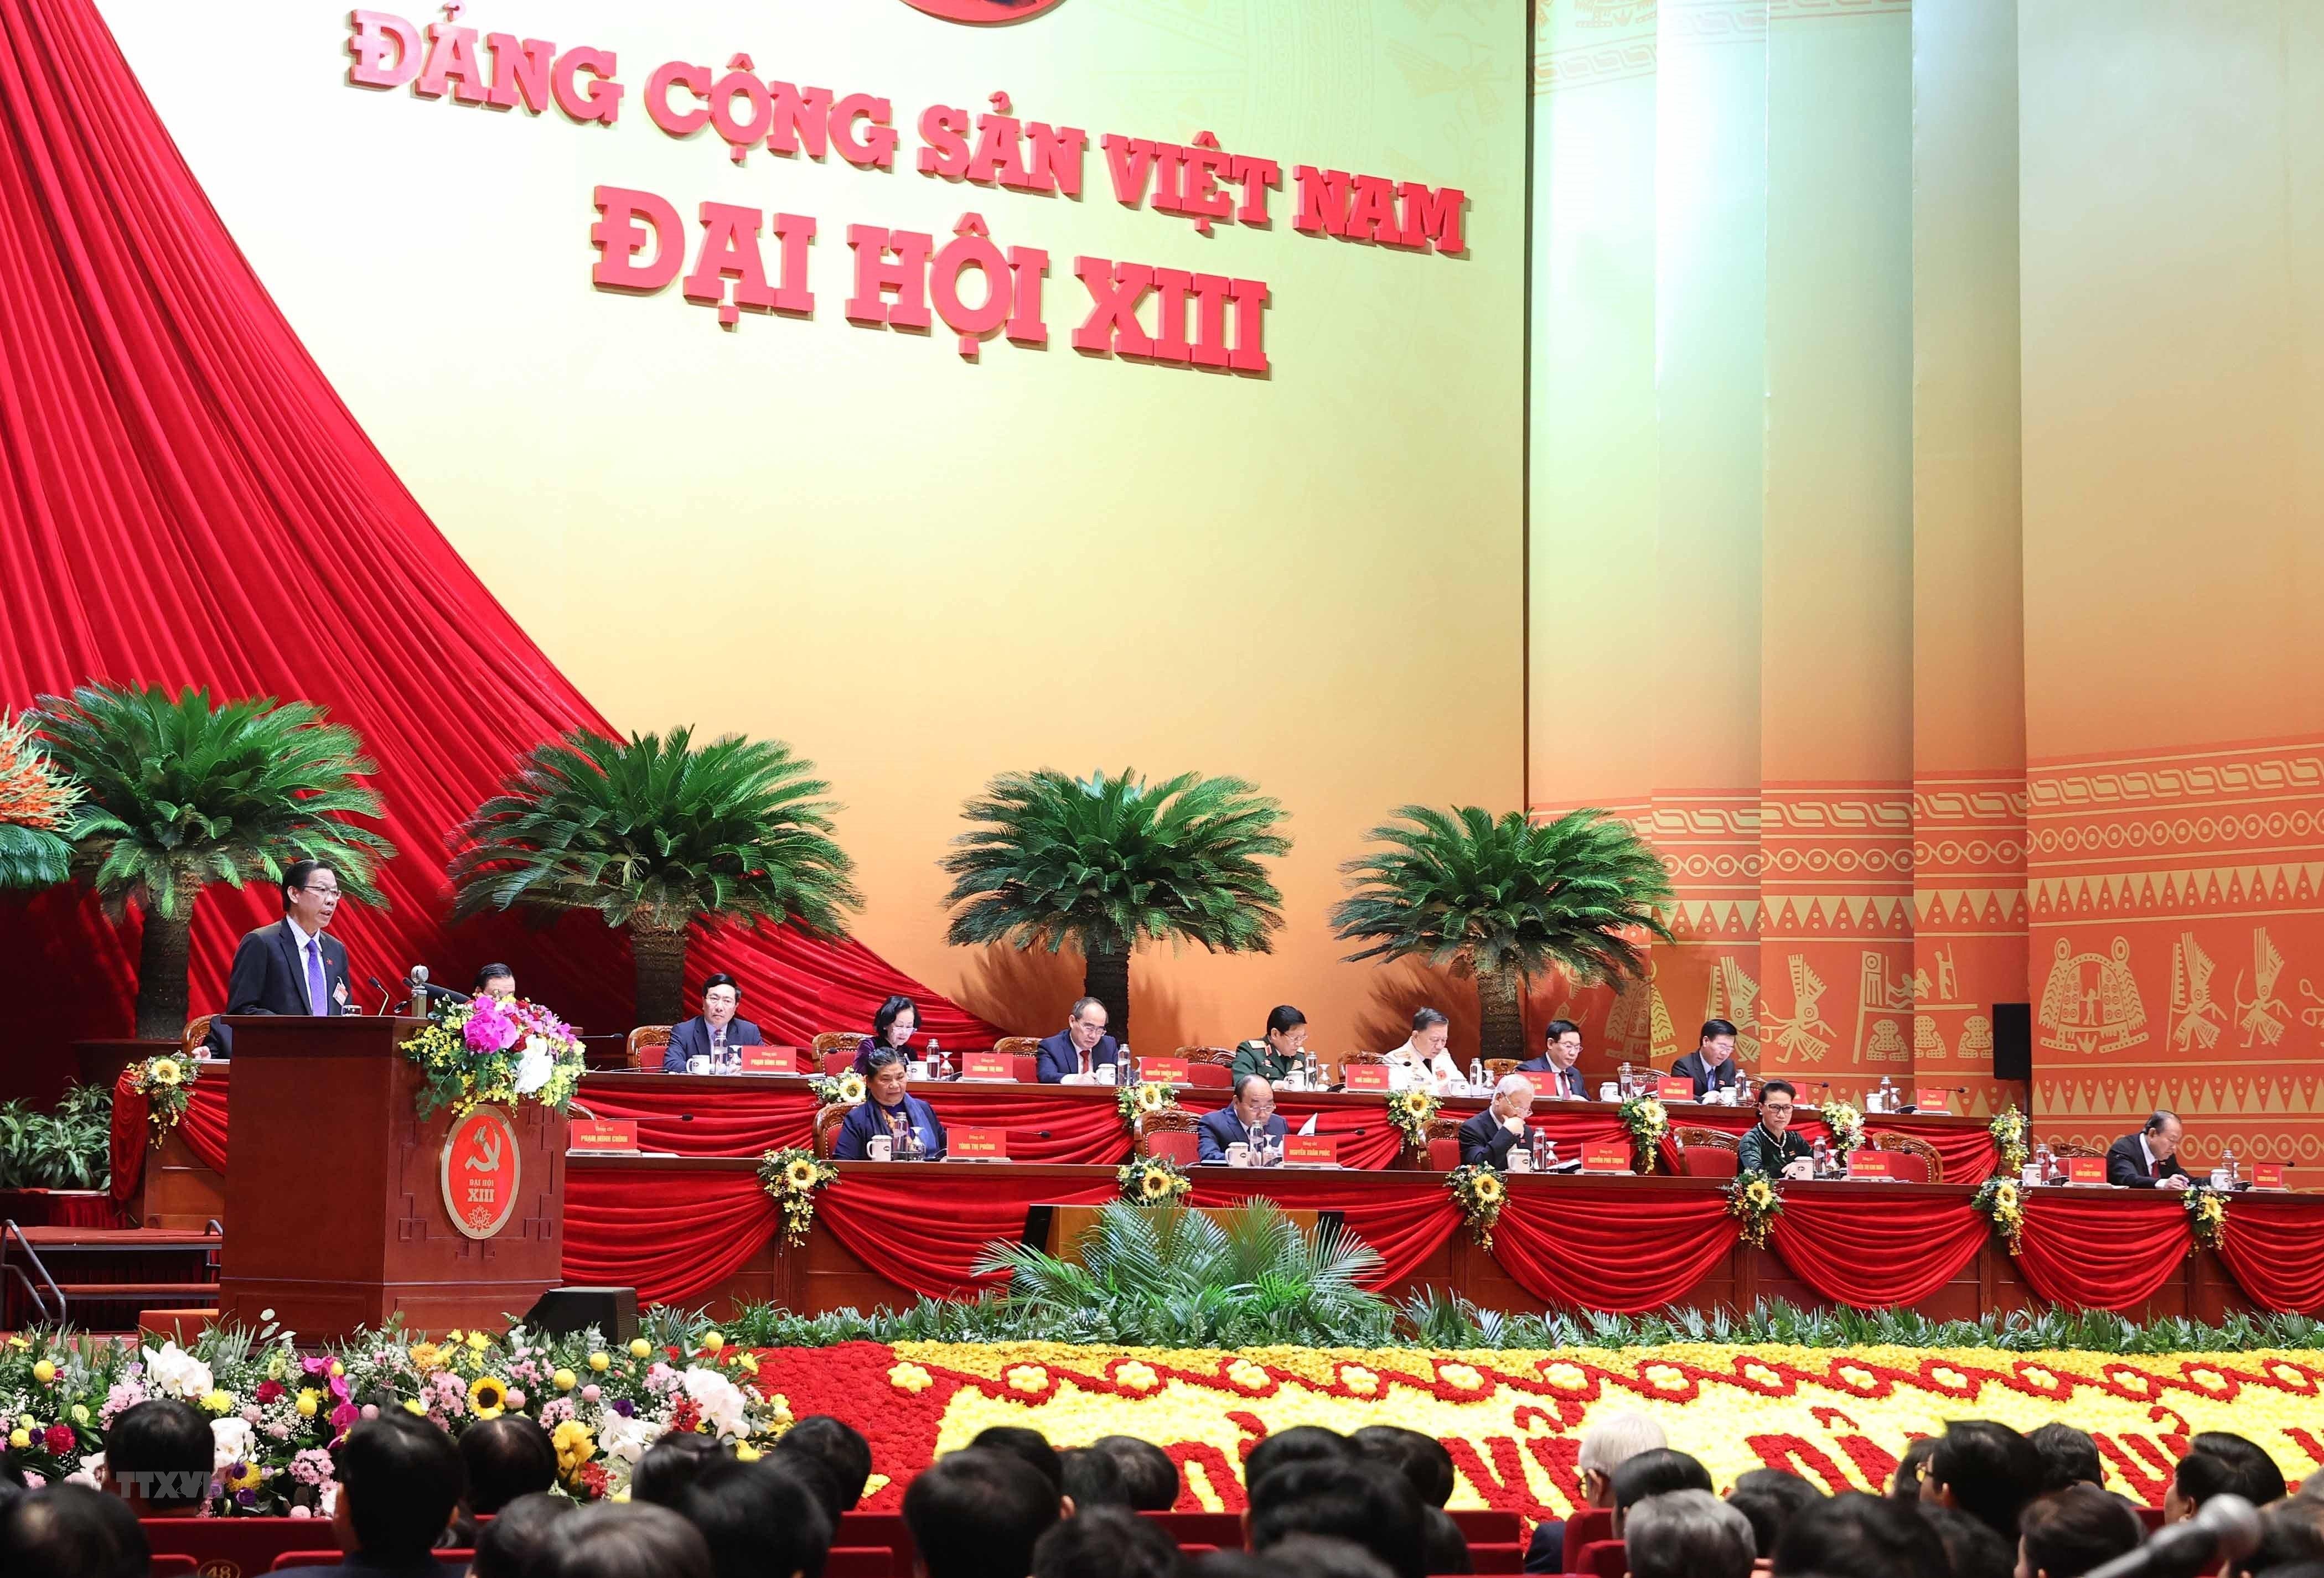 [Photo] Quang canh phien thao luan cac van kien Dai hoi XIII cua Dang hinh anh 2